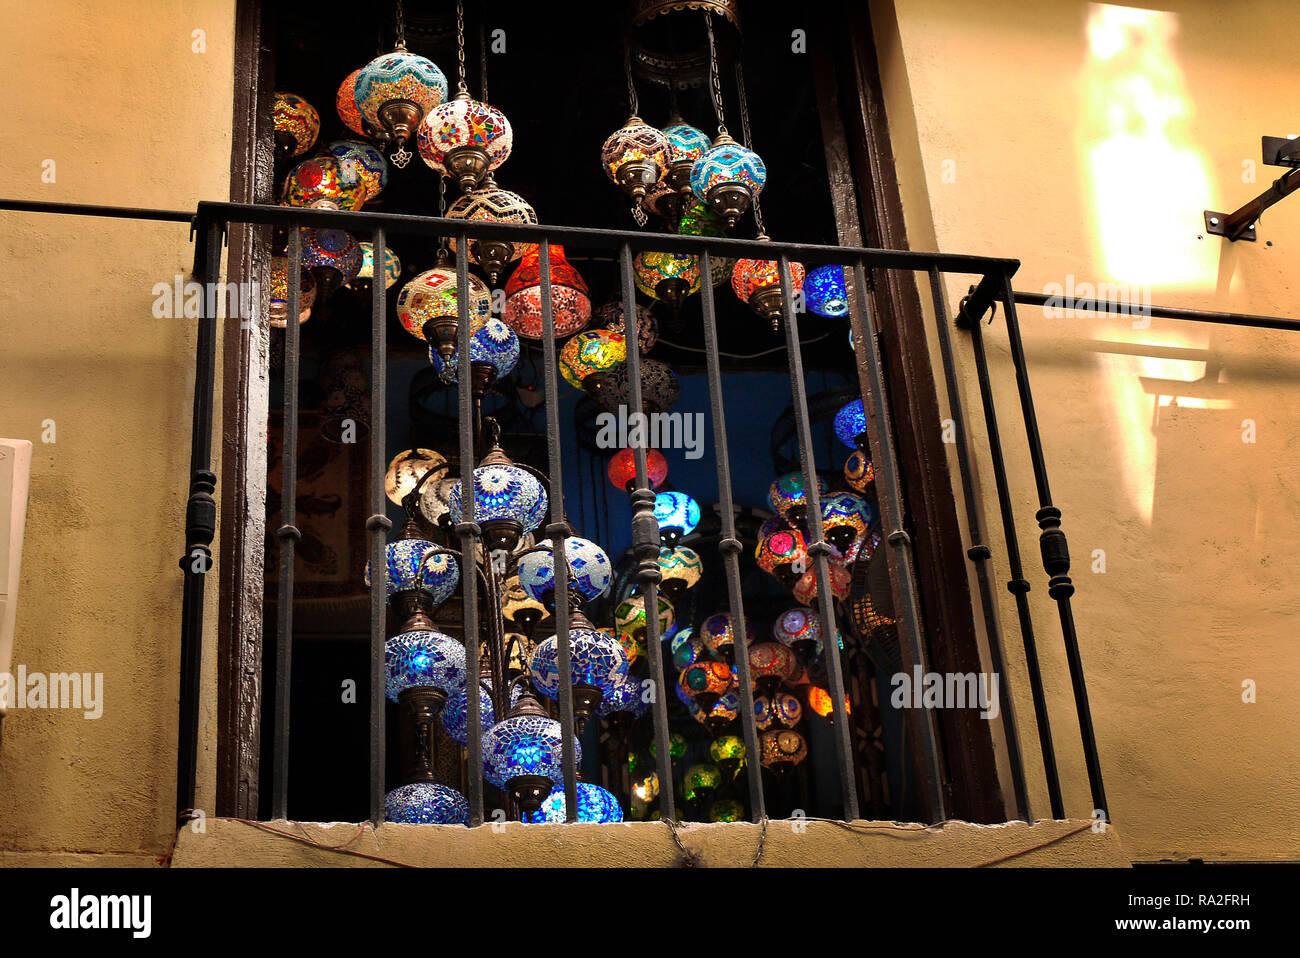 Lampes marocaines en vente à Grenade, Espagne. Photo Stock